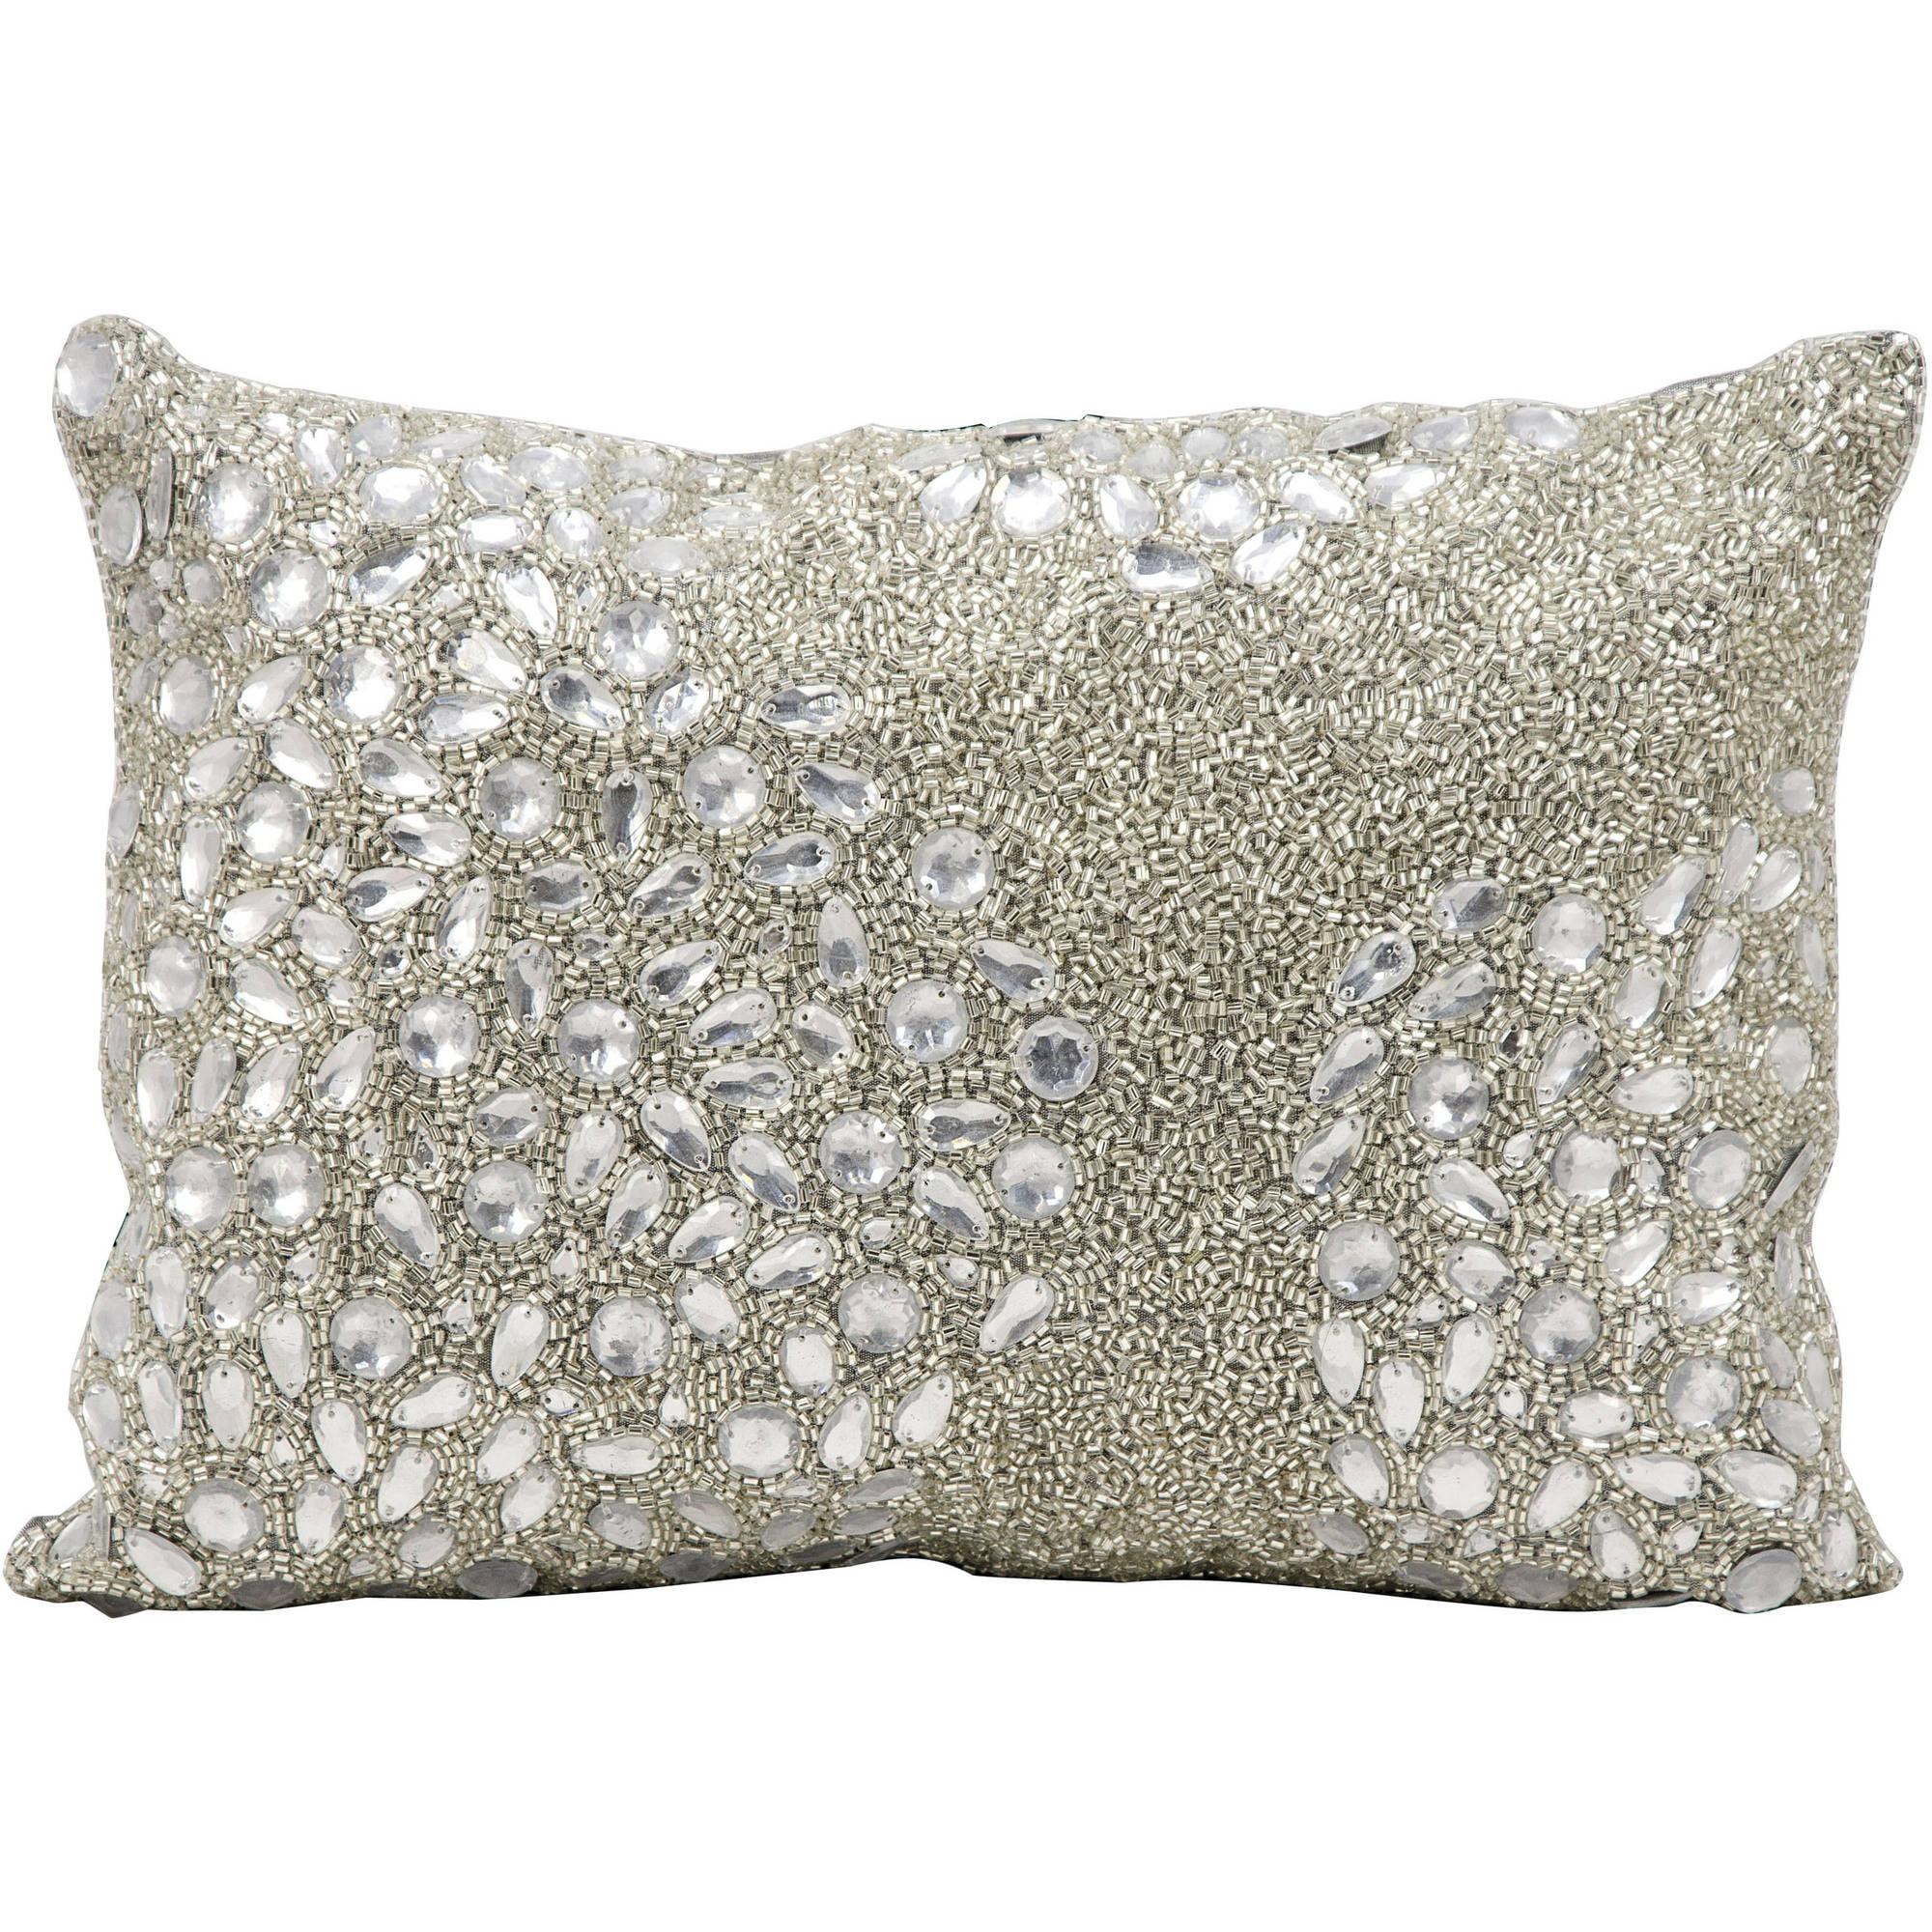 Nourison Luminecence Fully Beaded Decorative Pillow